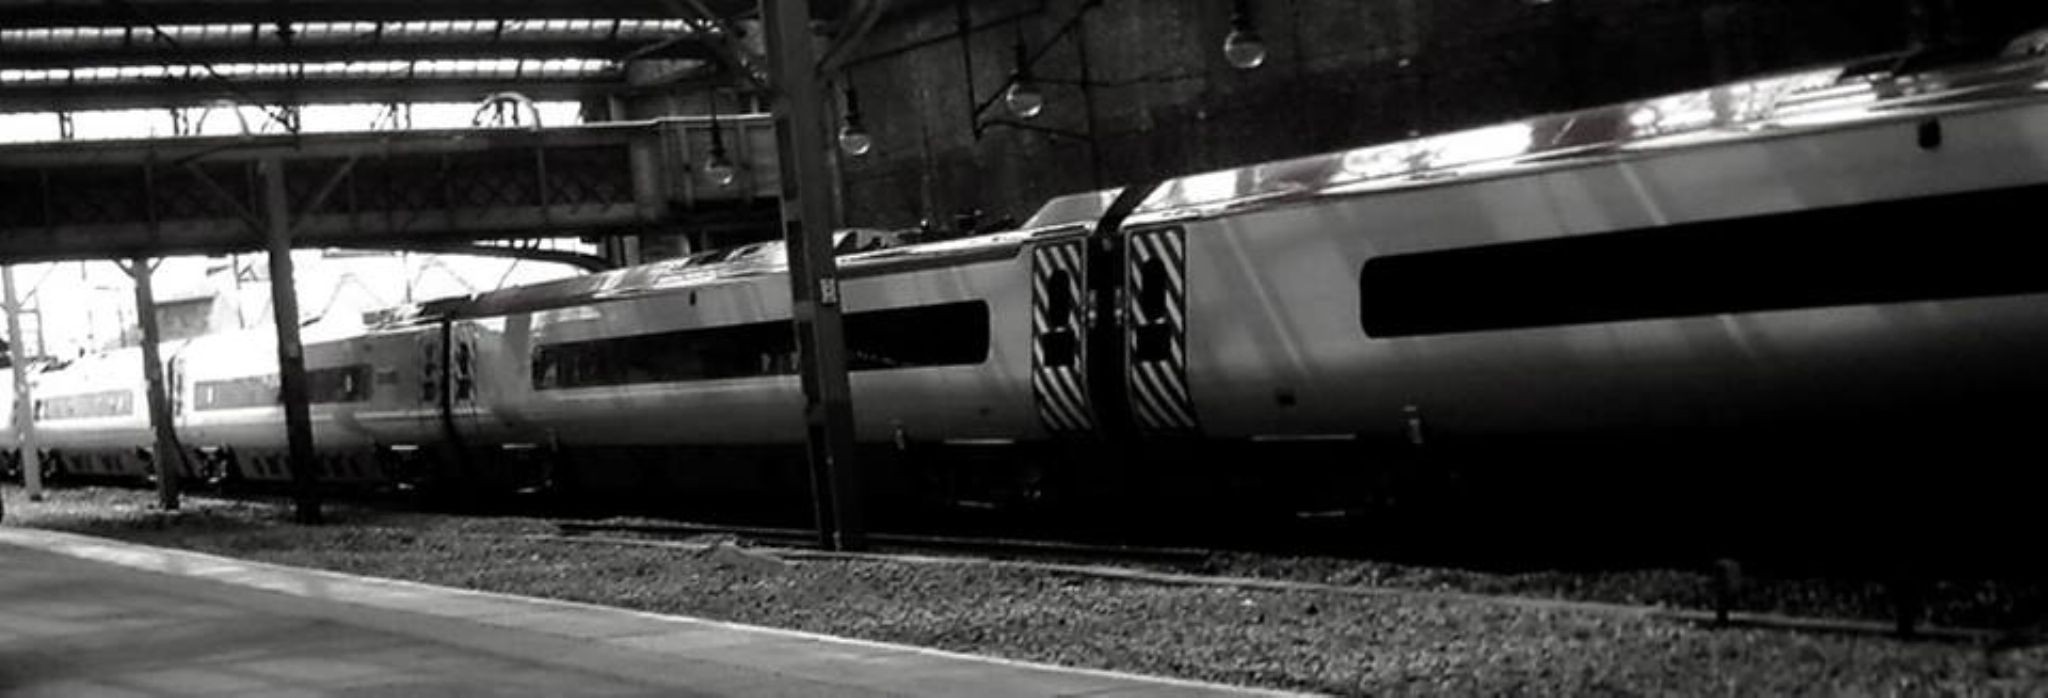 stoke station staffordshire by chris.adams.3557